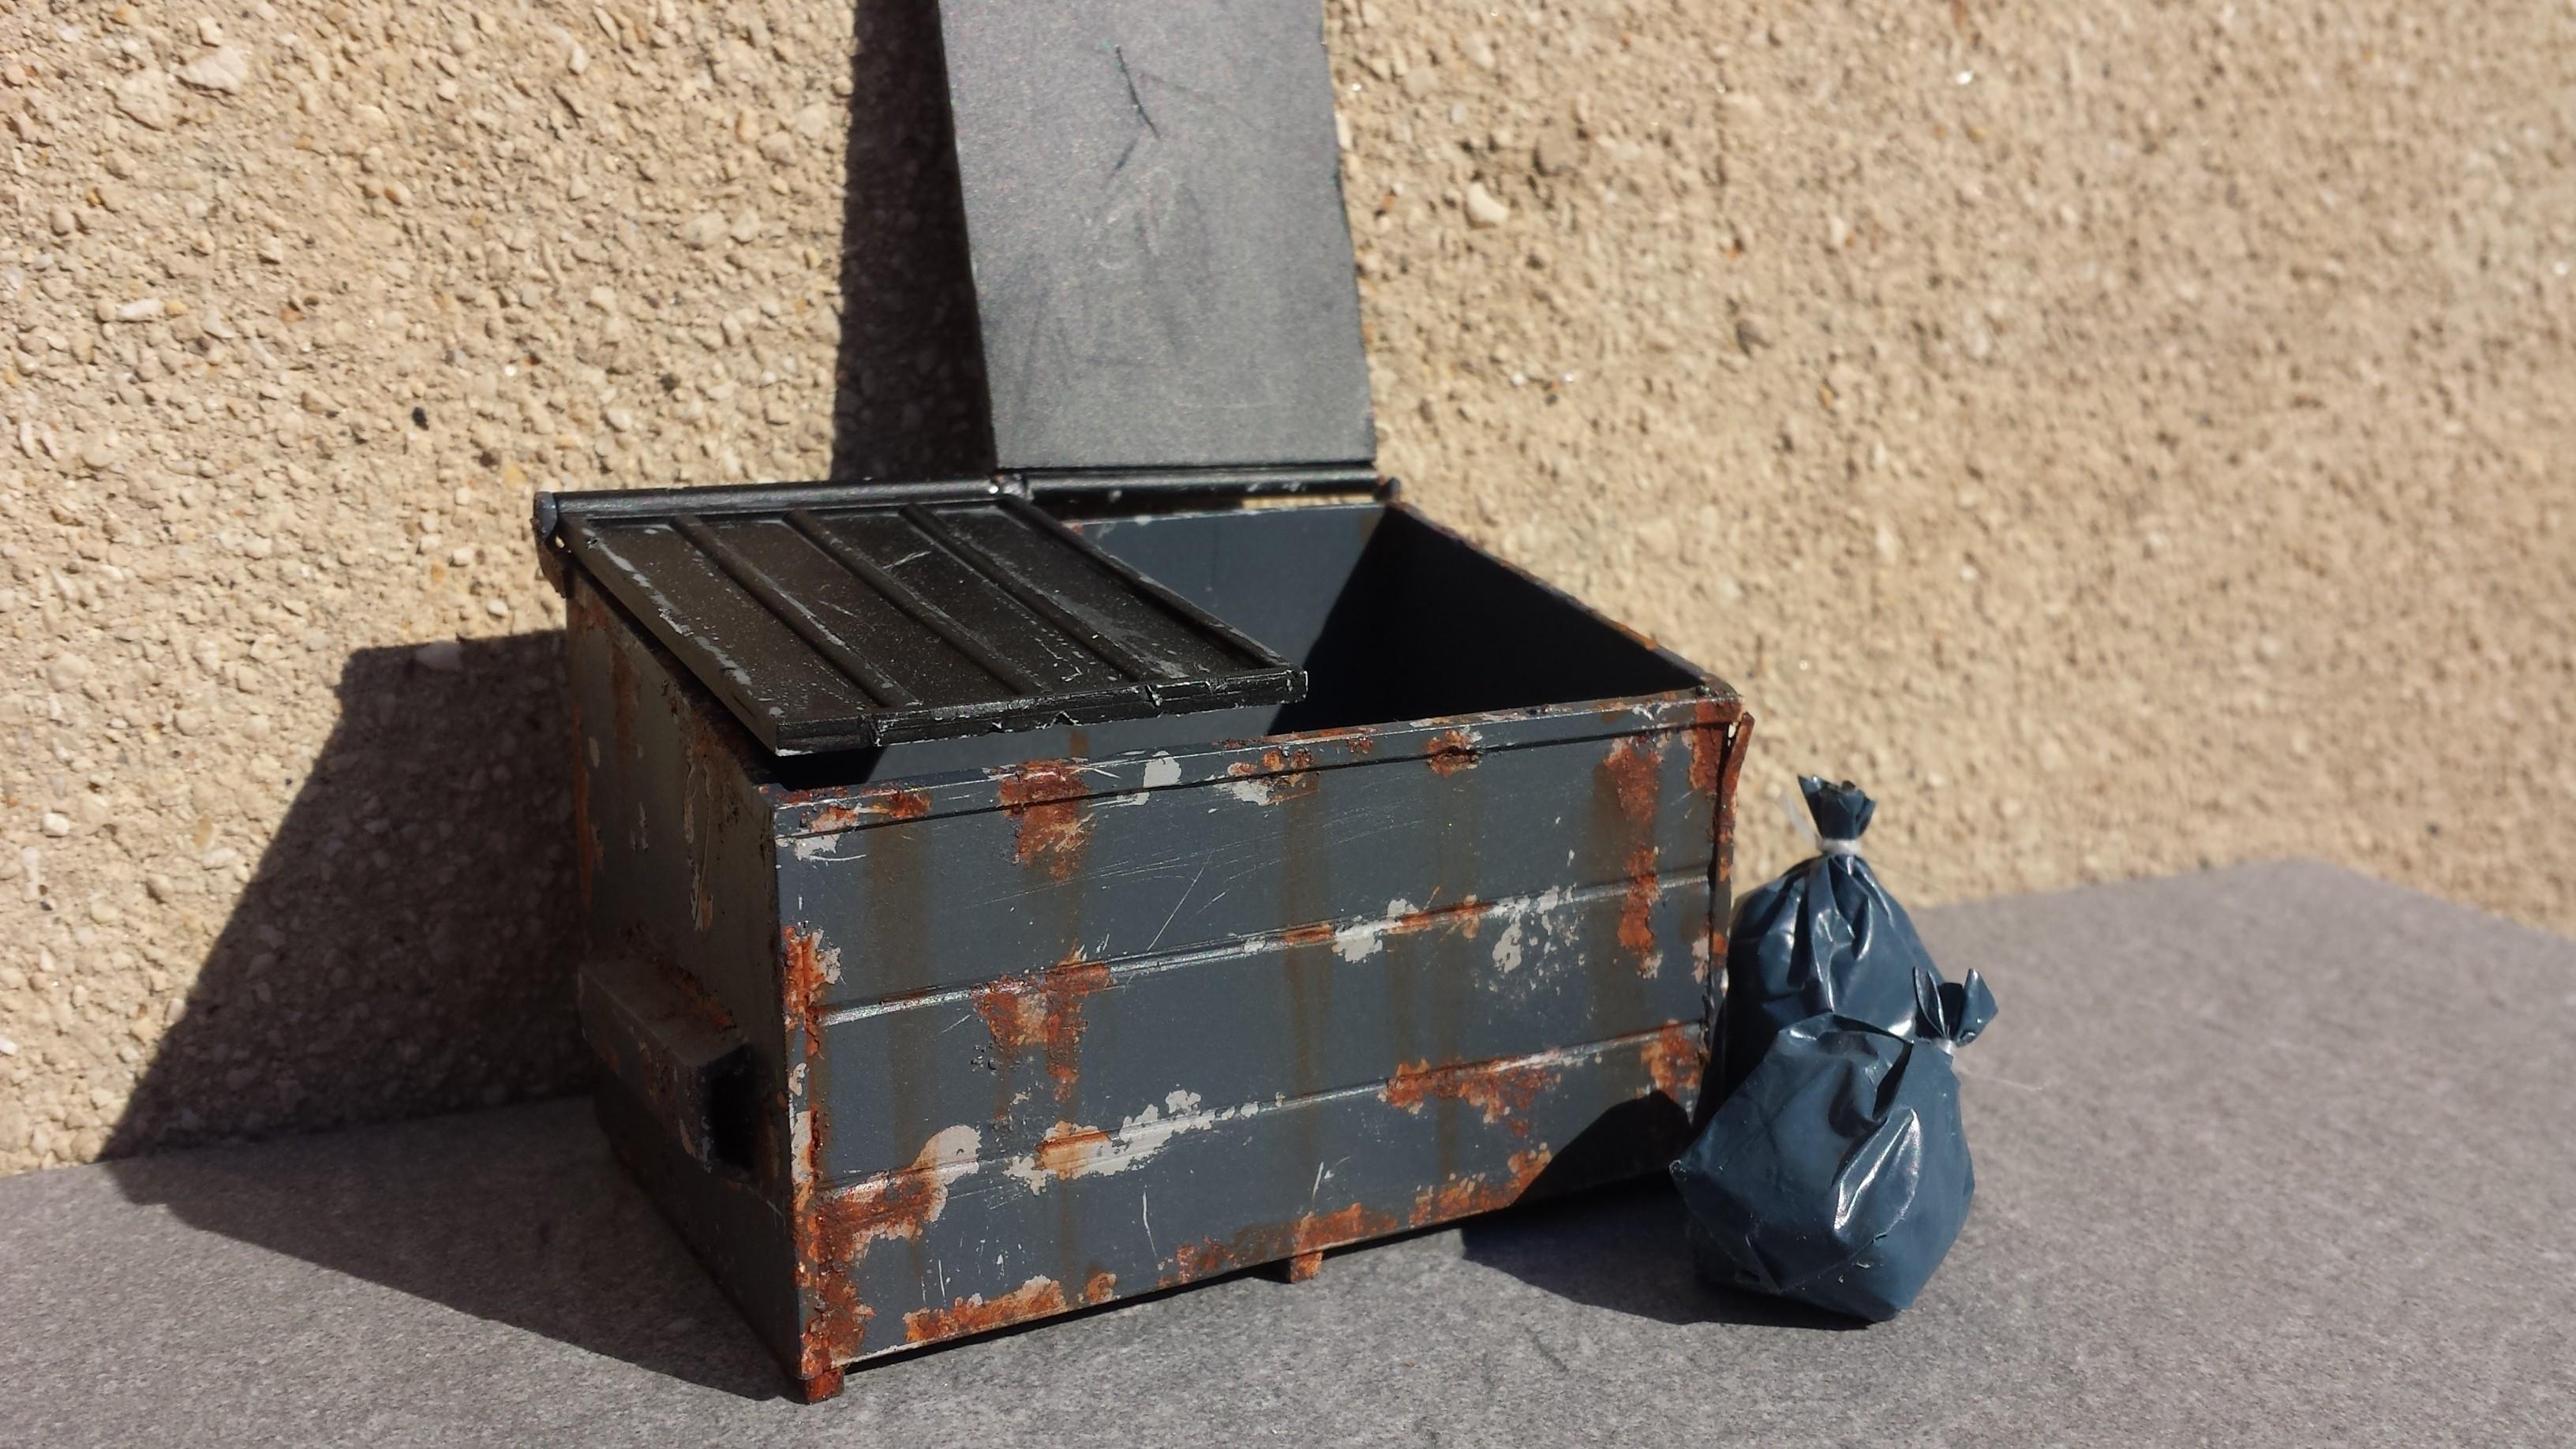 benne à ordures/garbage container - Page 2 Imruz